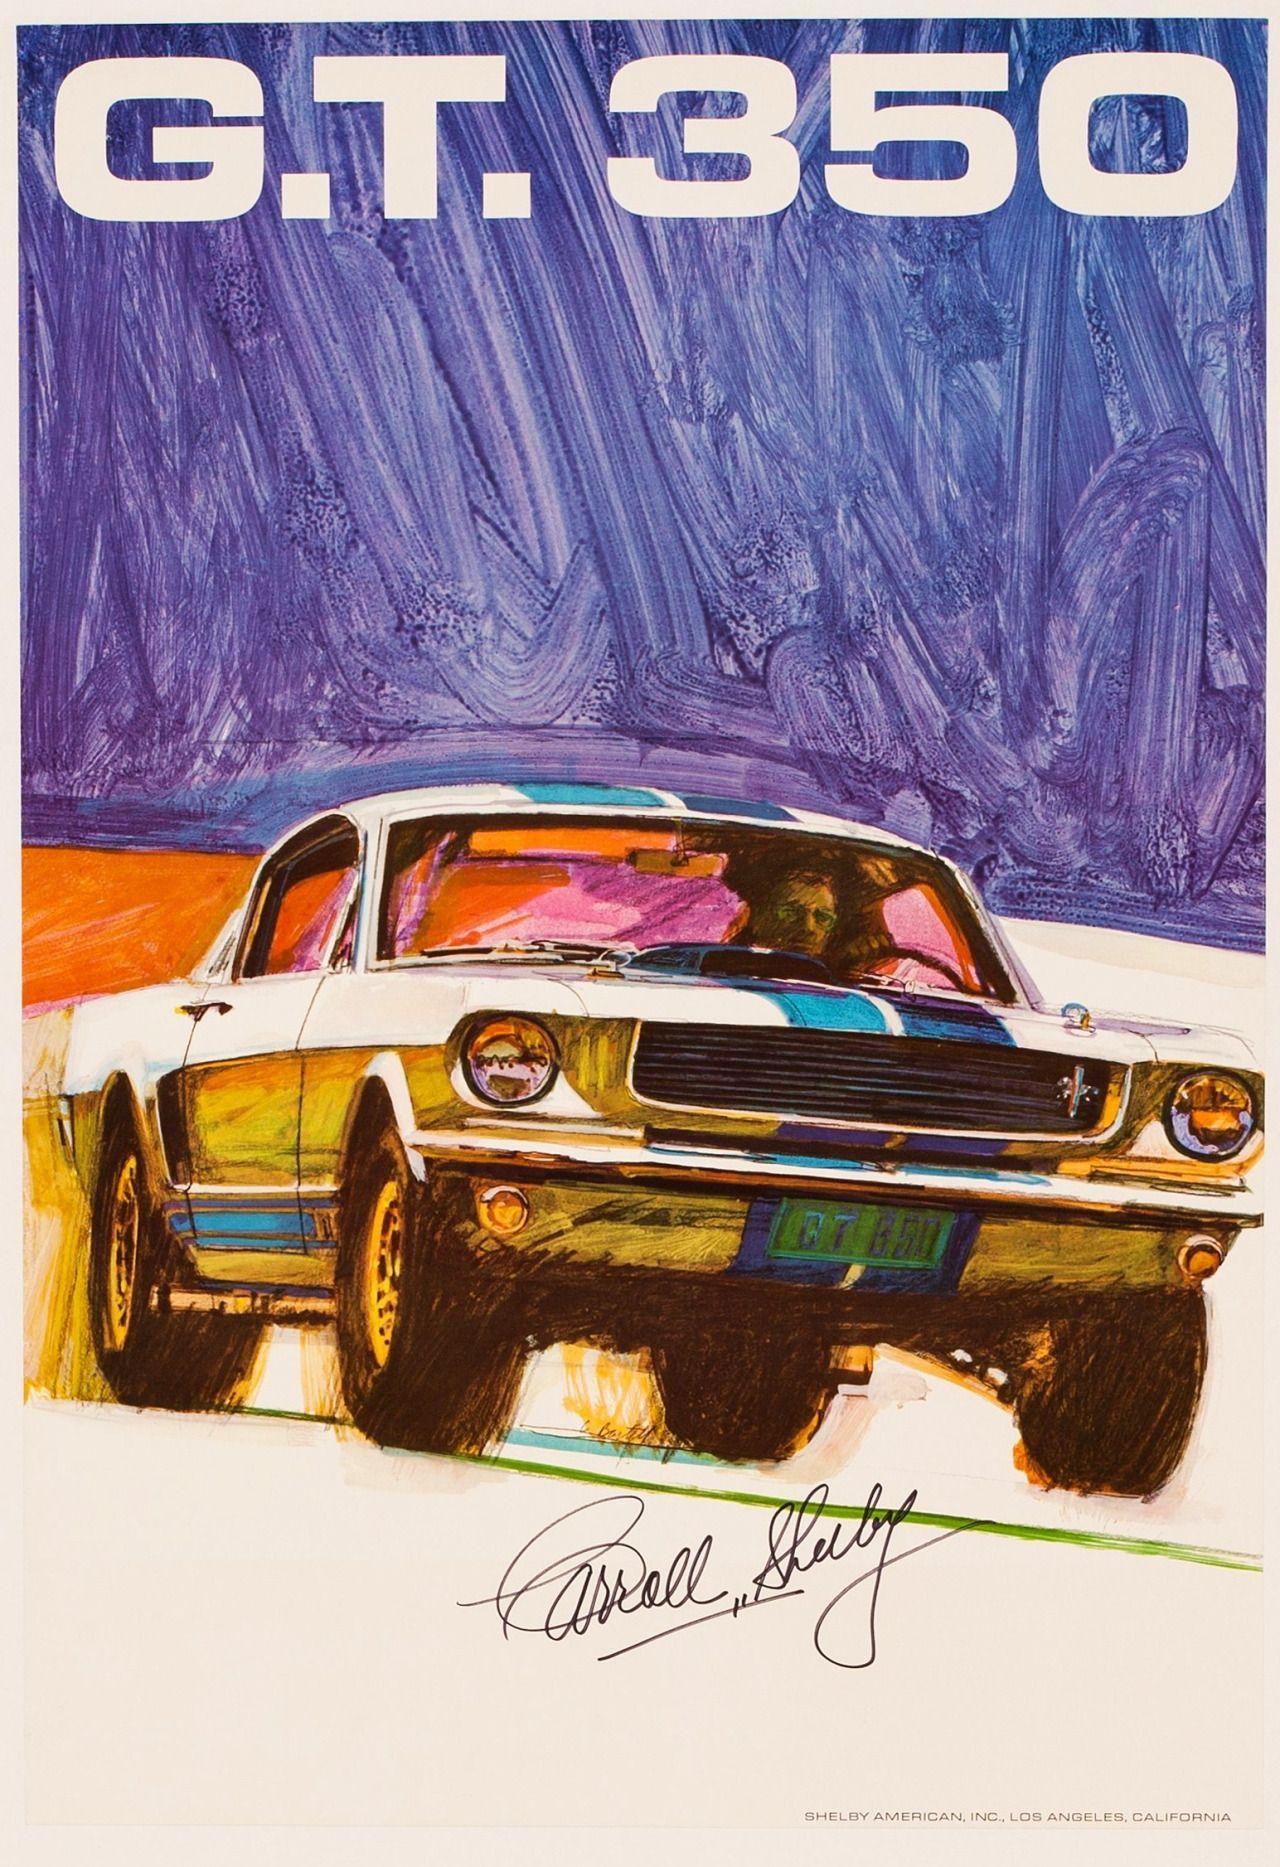 Affiche Shelby GT 350 Signée par Carroll Shelby c.1968 - Heritage ...